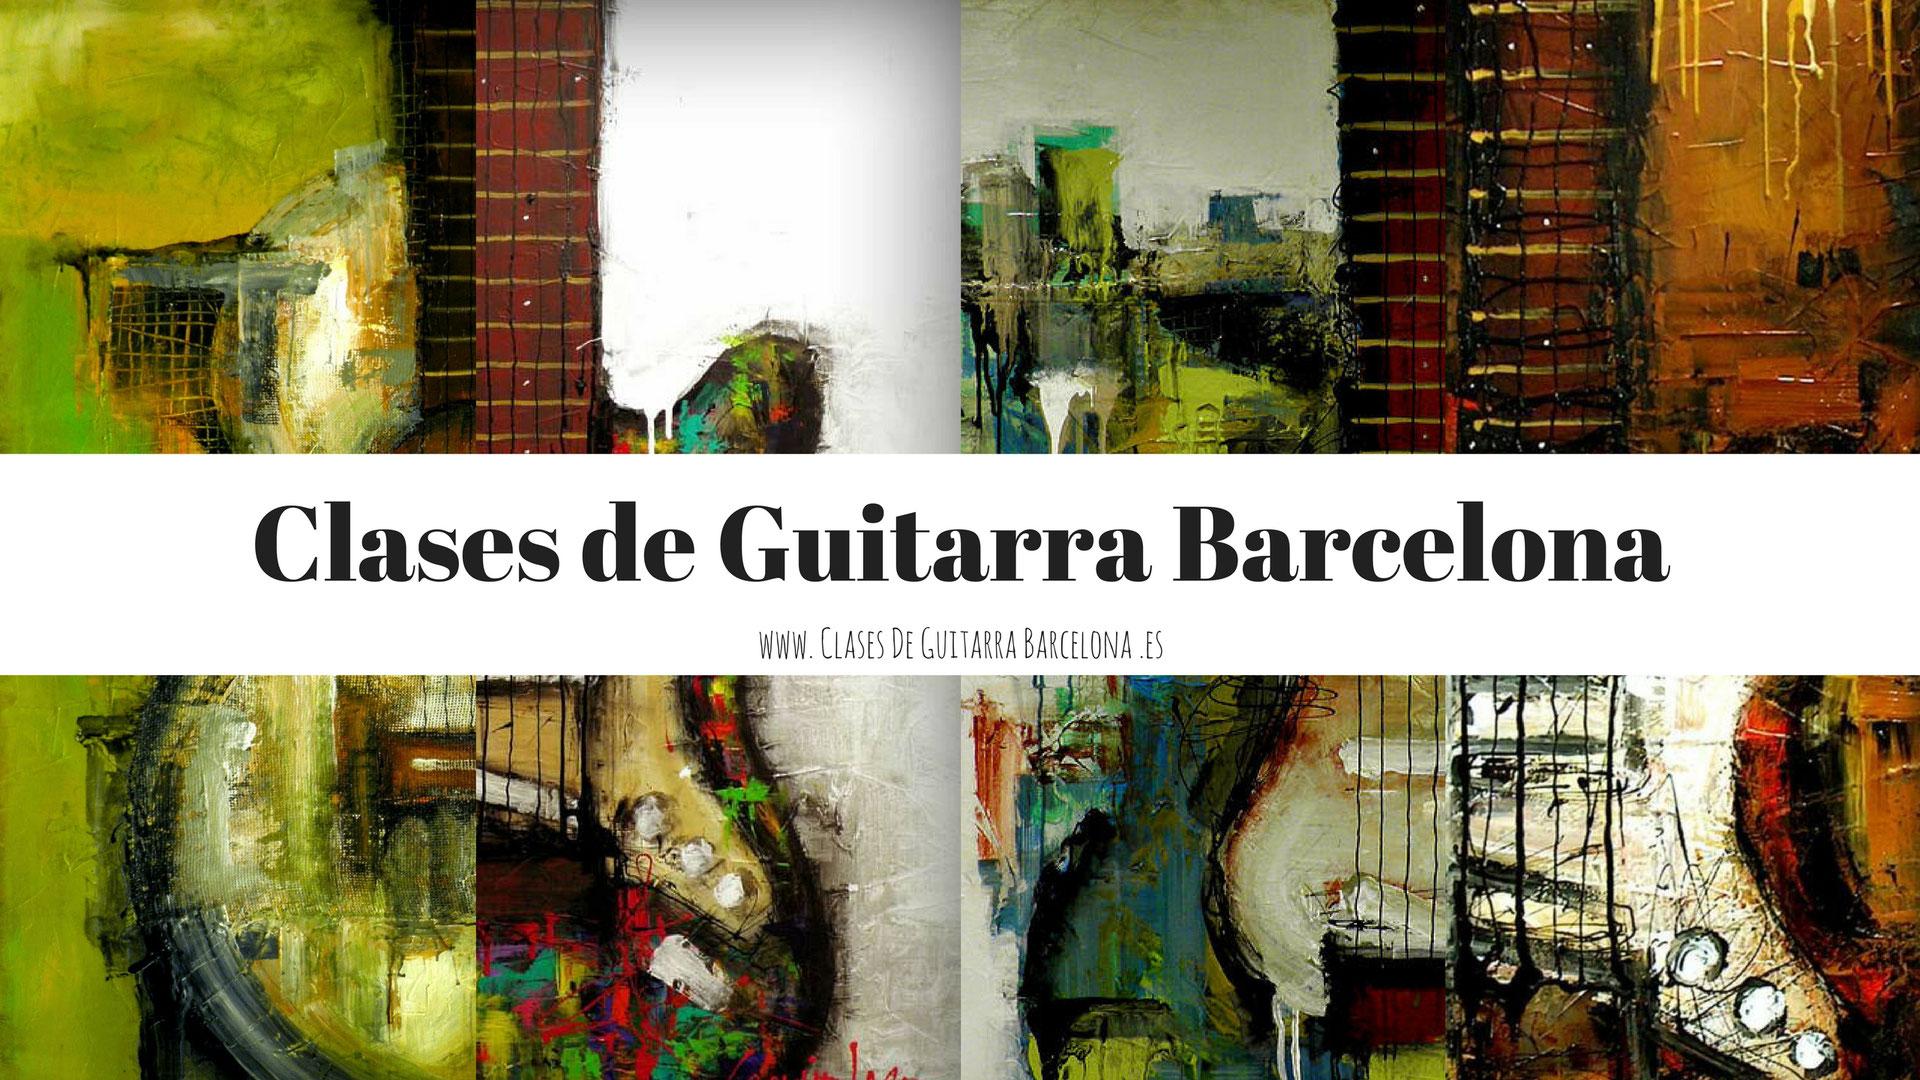 Clases de guitarra barcelona clases de guitarra barcelona for Guitarras barcelona